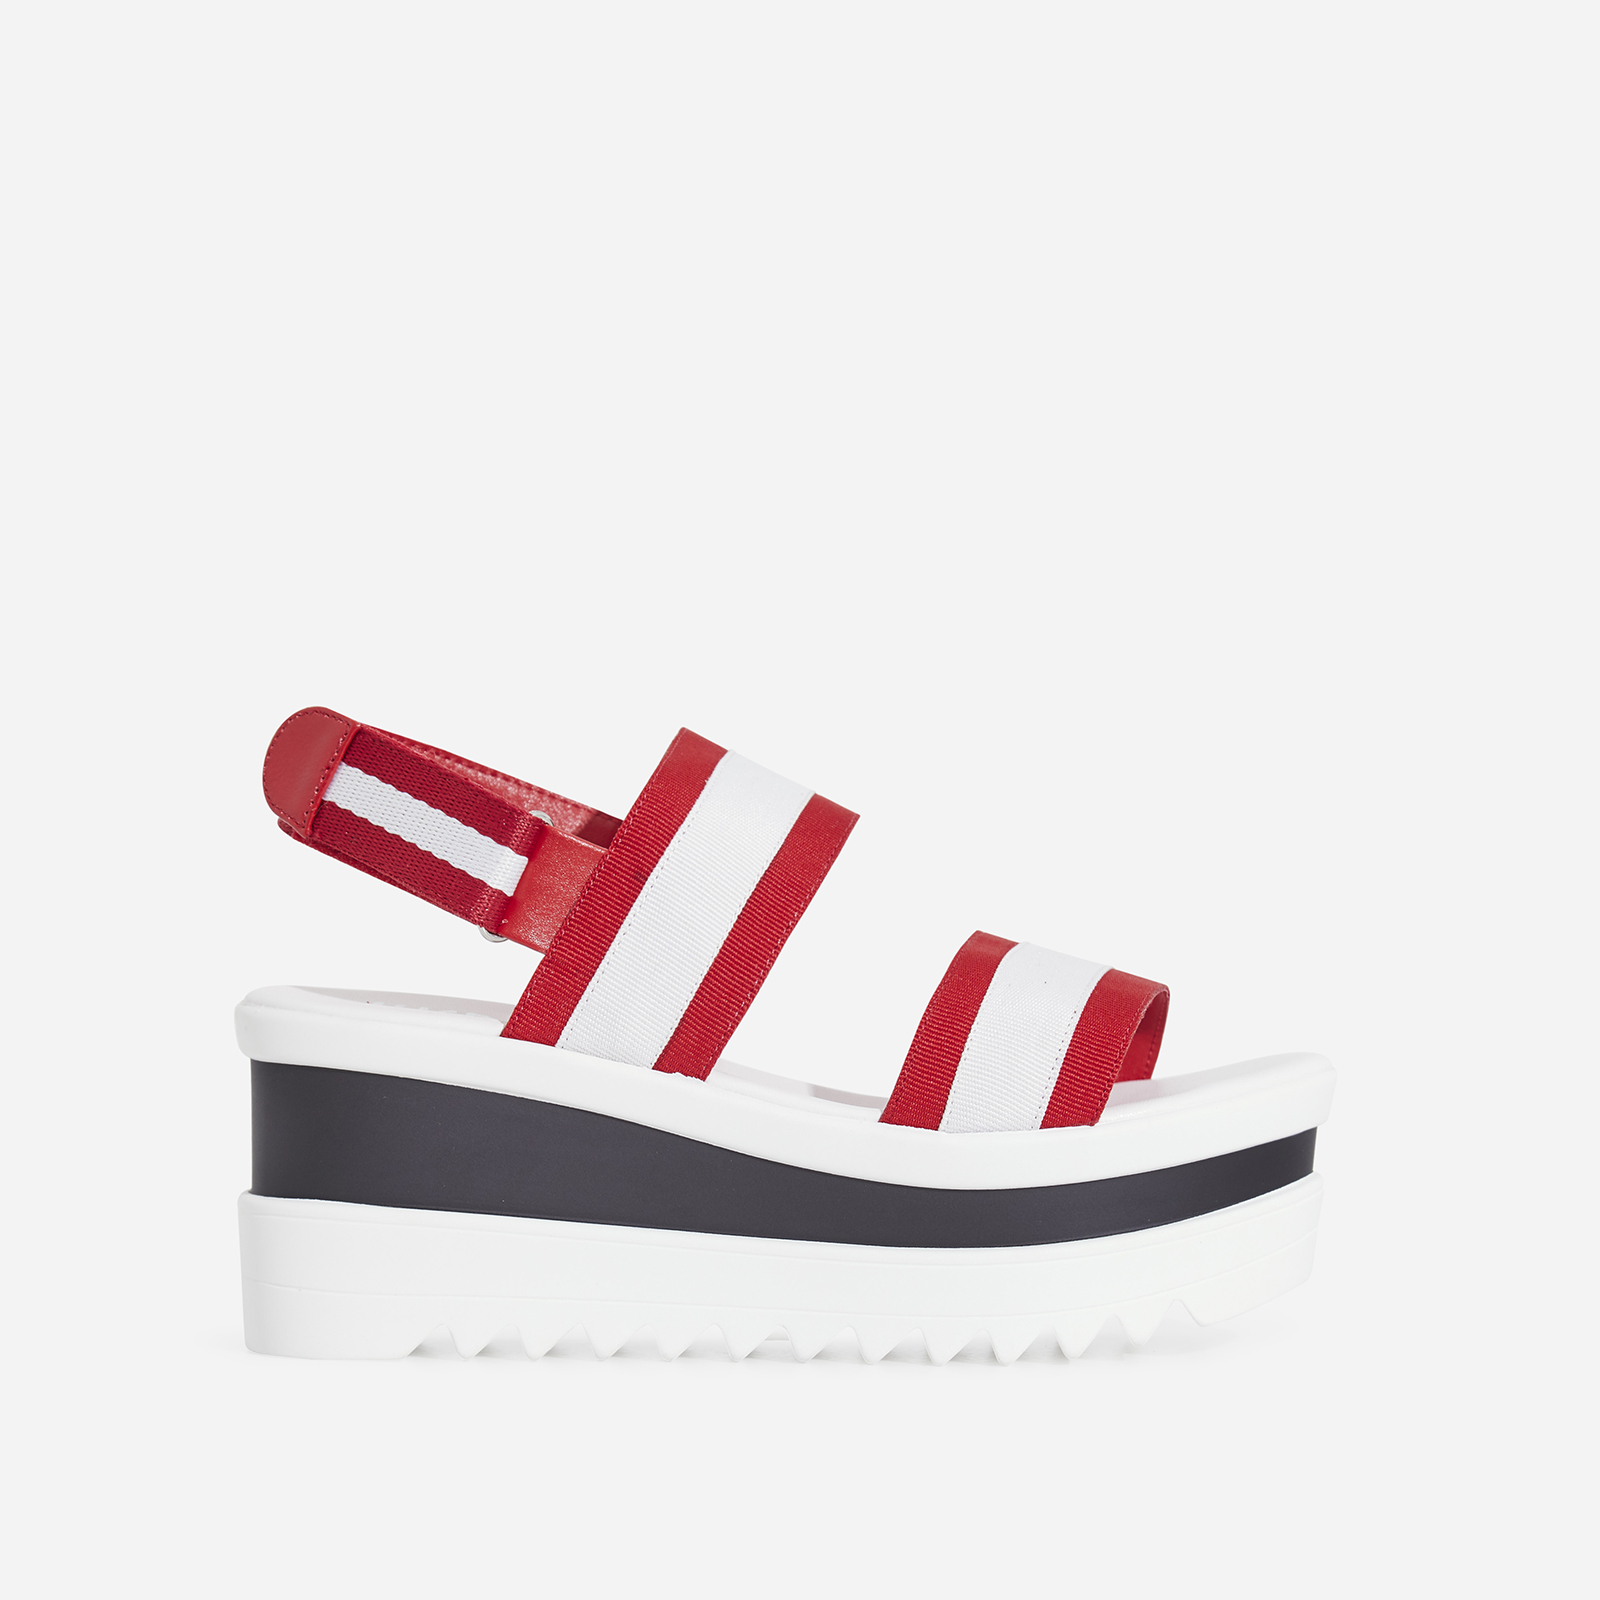 Hani Chunky Sole Sandal In Red Grosgrain